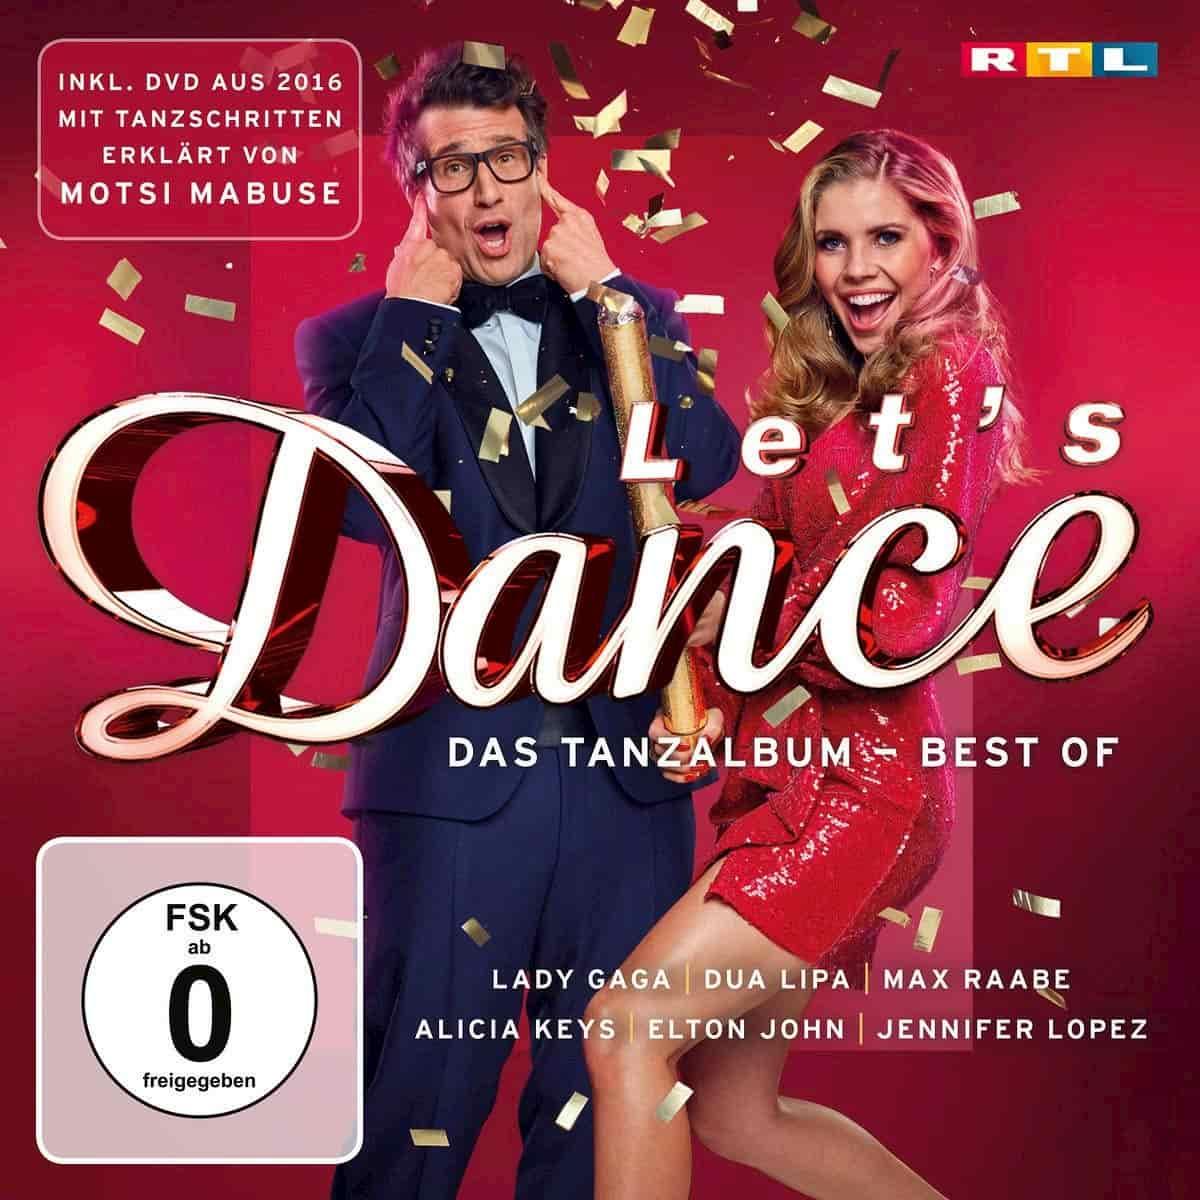 Let's dance CD 2020 - Best of Let's dance - Das Tanz-Album